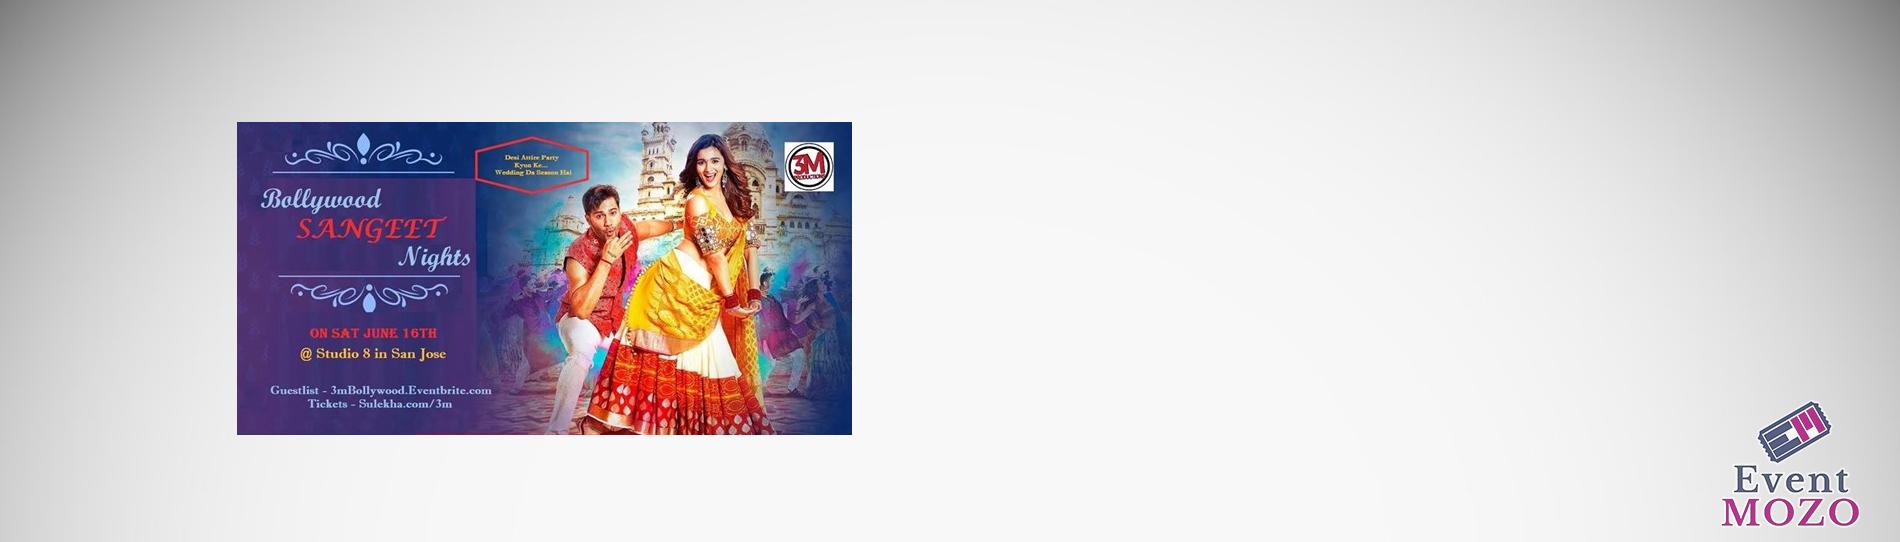 EventMozo Bollywood Sangeet Nights - Desi Attire Party